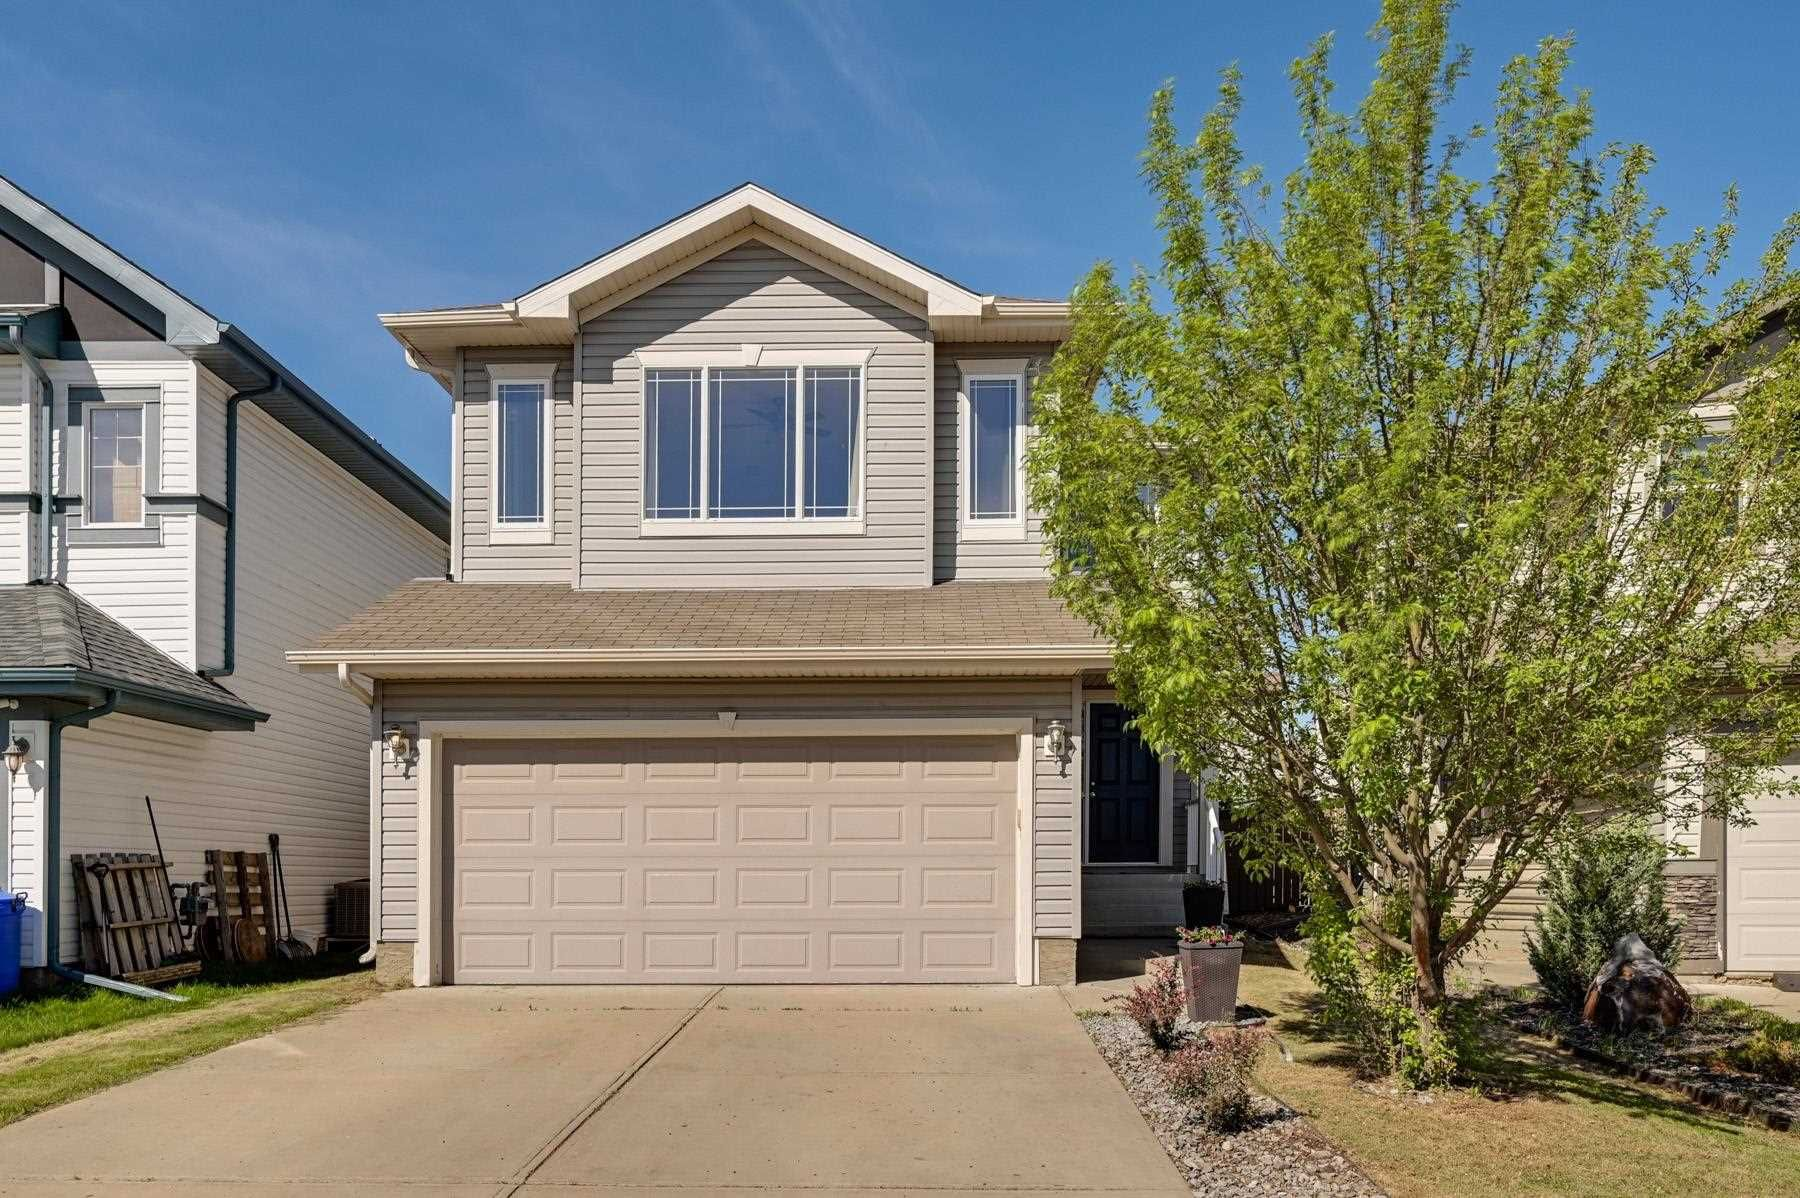 Main Photo: 9266 212 Street in Edmonton: Zone 58 House for sale : MLS®# E4249950